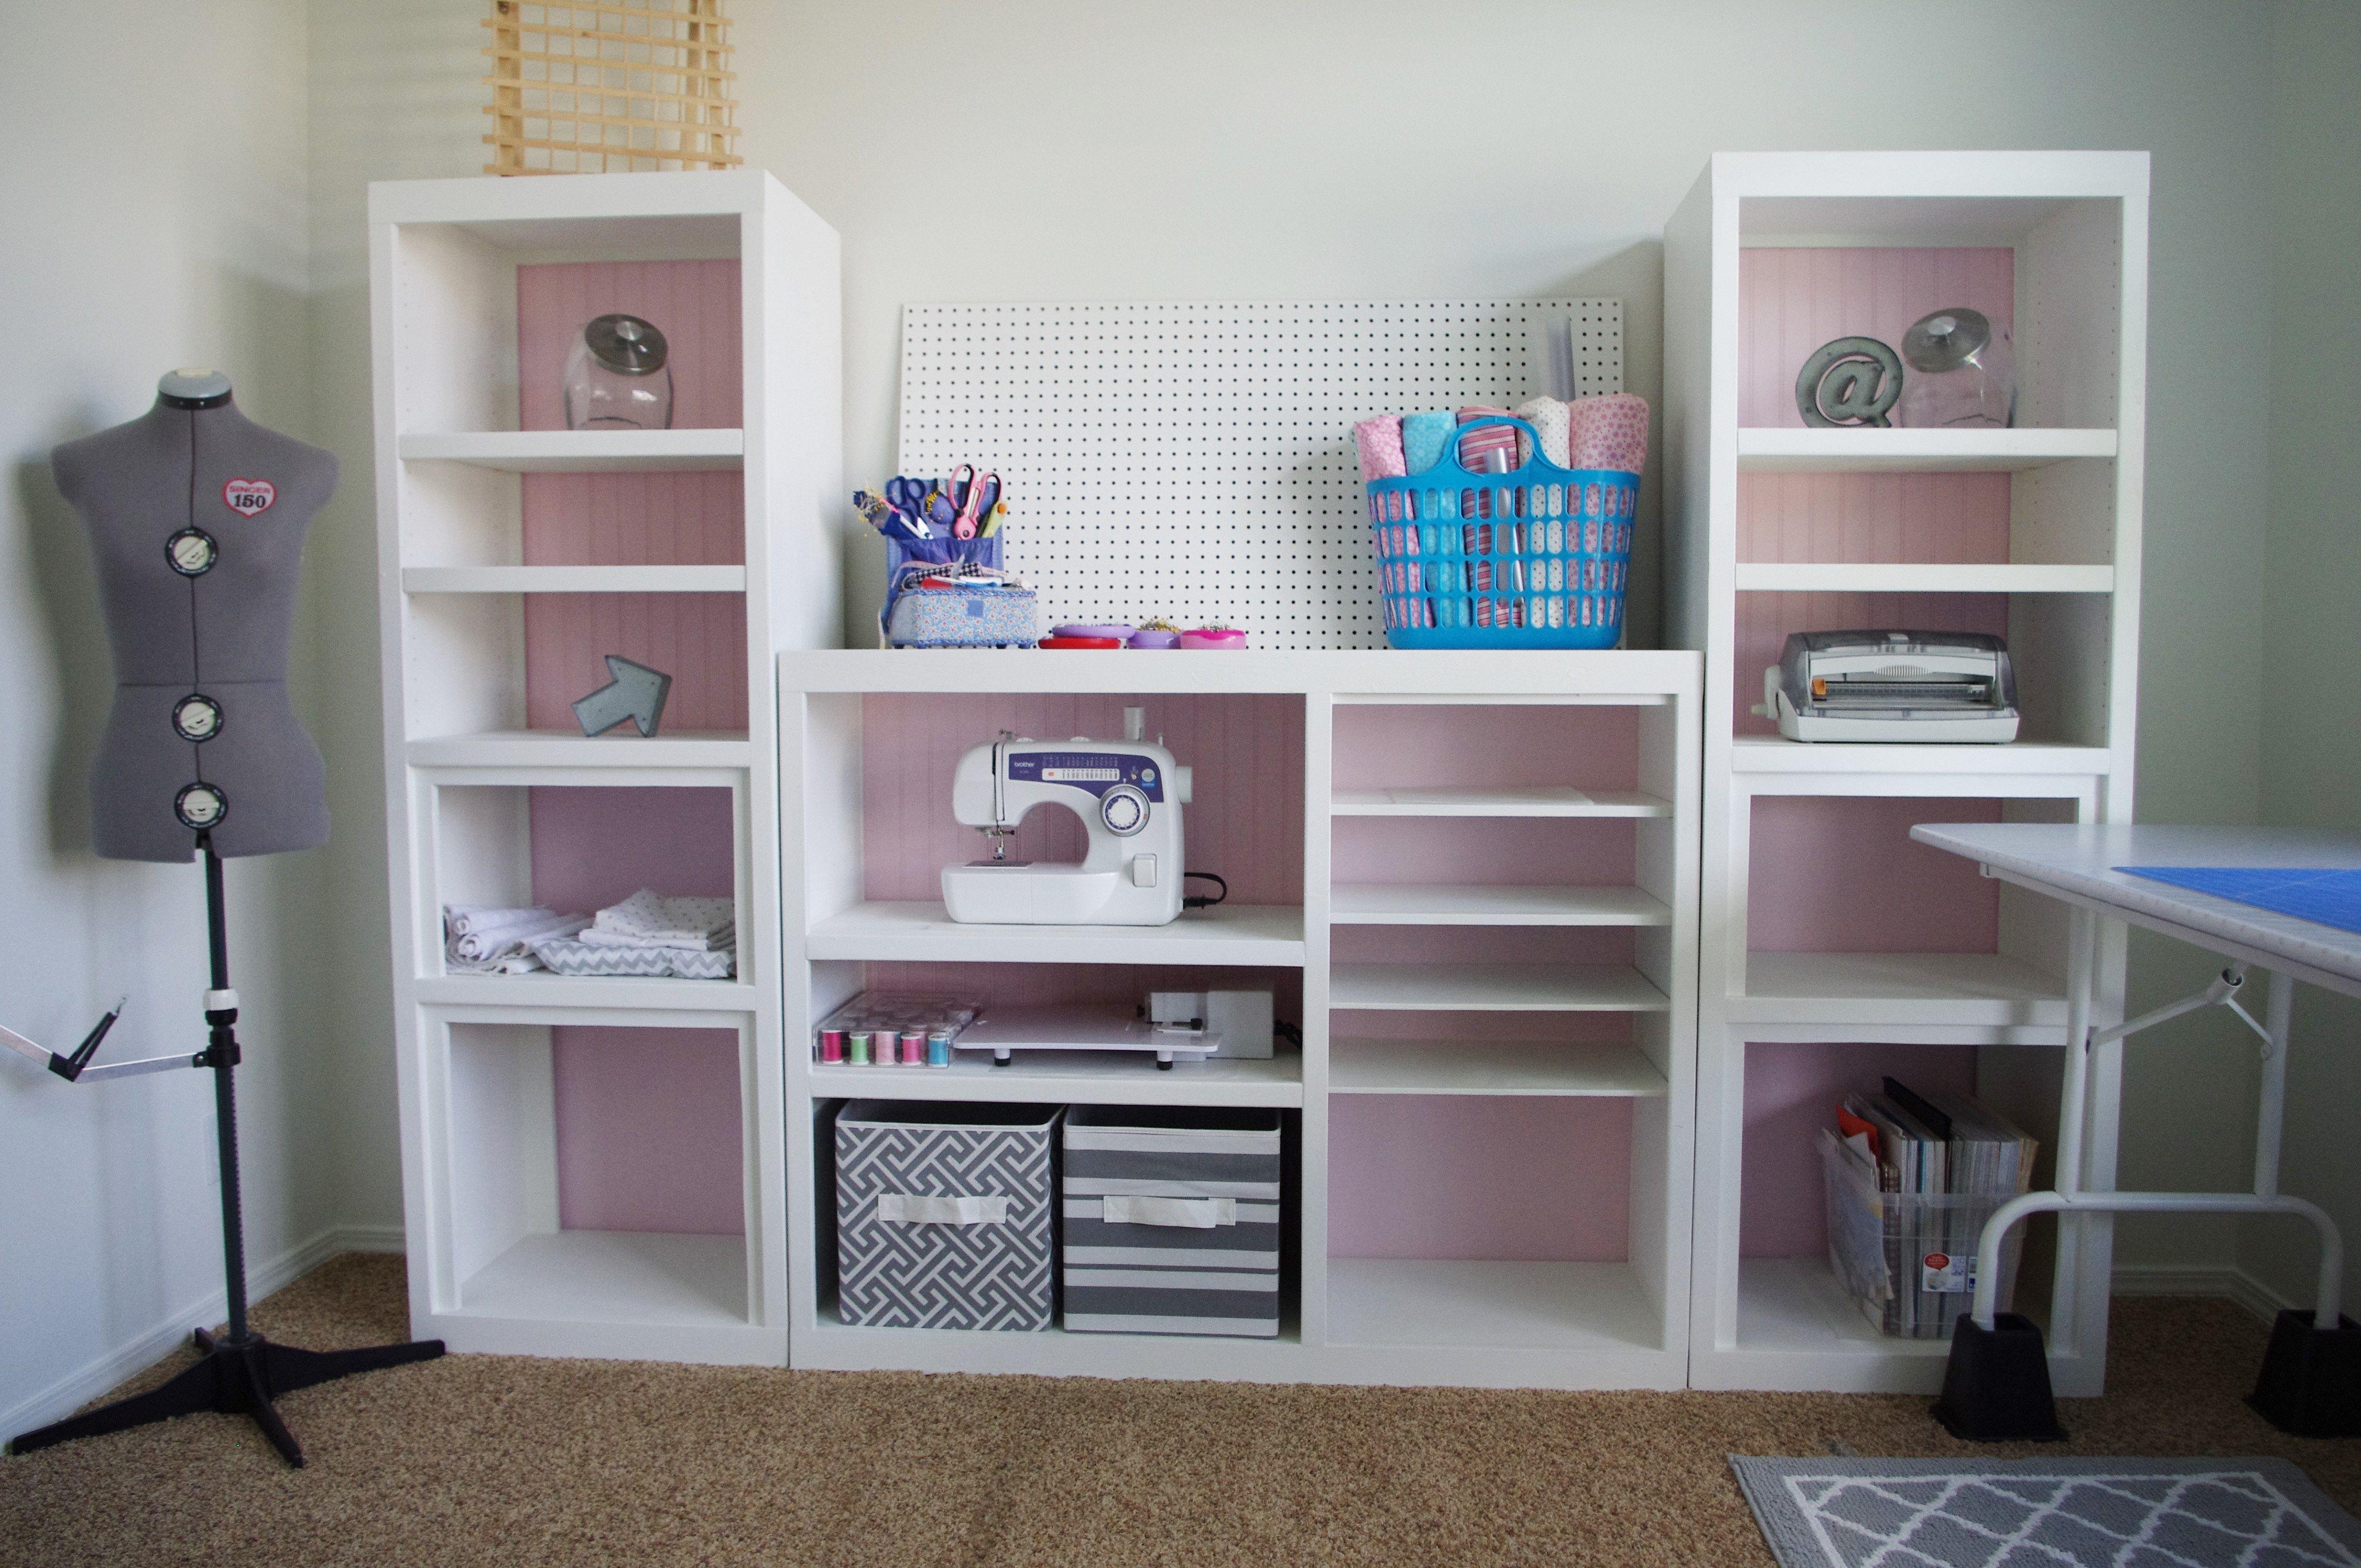 Diy Craft Room Wall Storage Organizer Unit Furniture Makeover Project Tutorial From A 90s Oak Entertainment Center Room Design Ideas Diy Diy Craft Room Craft Room Design